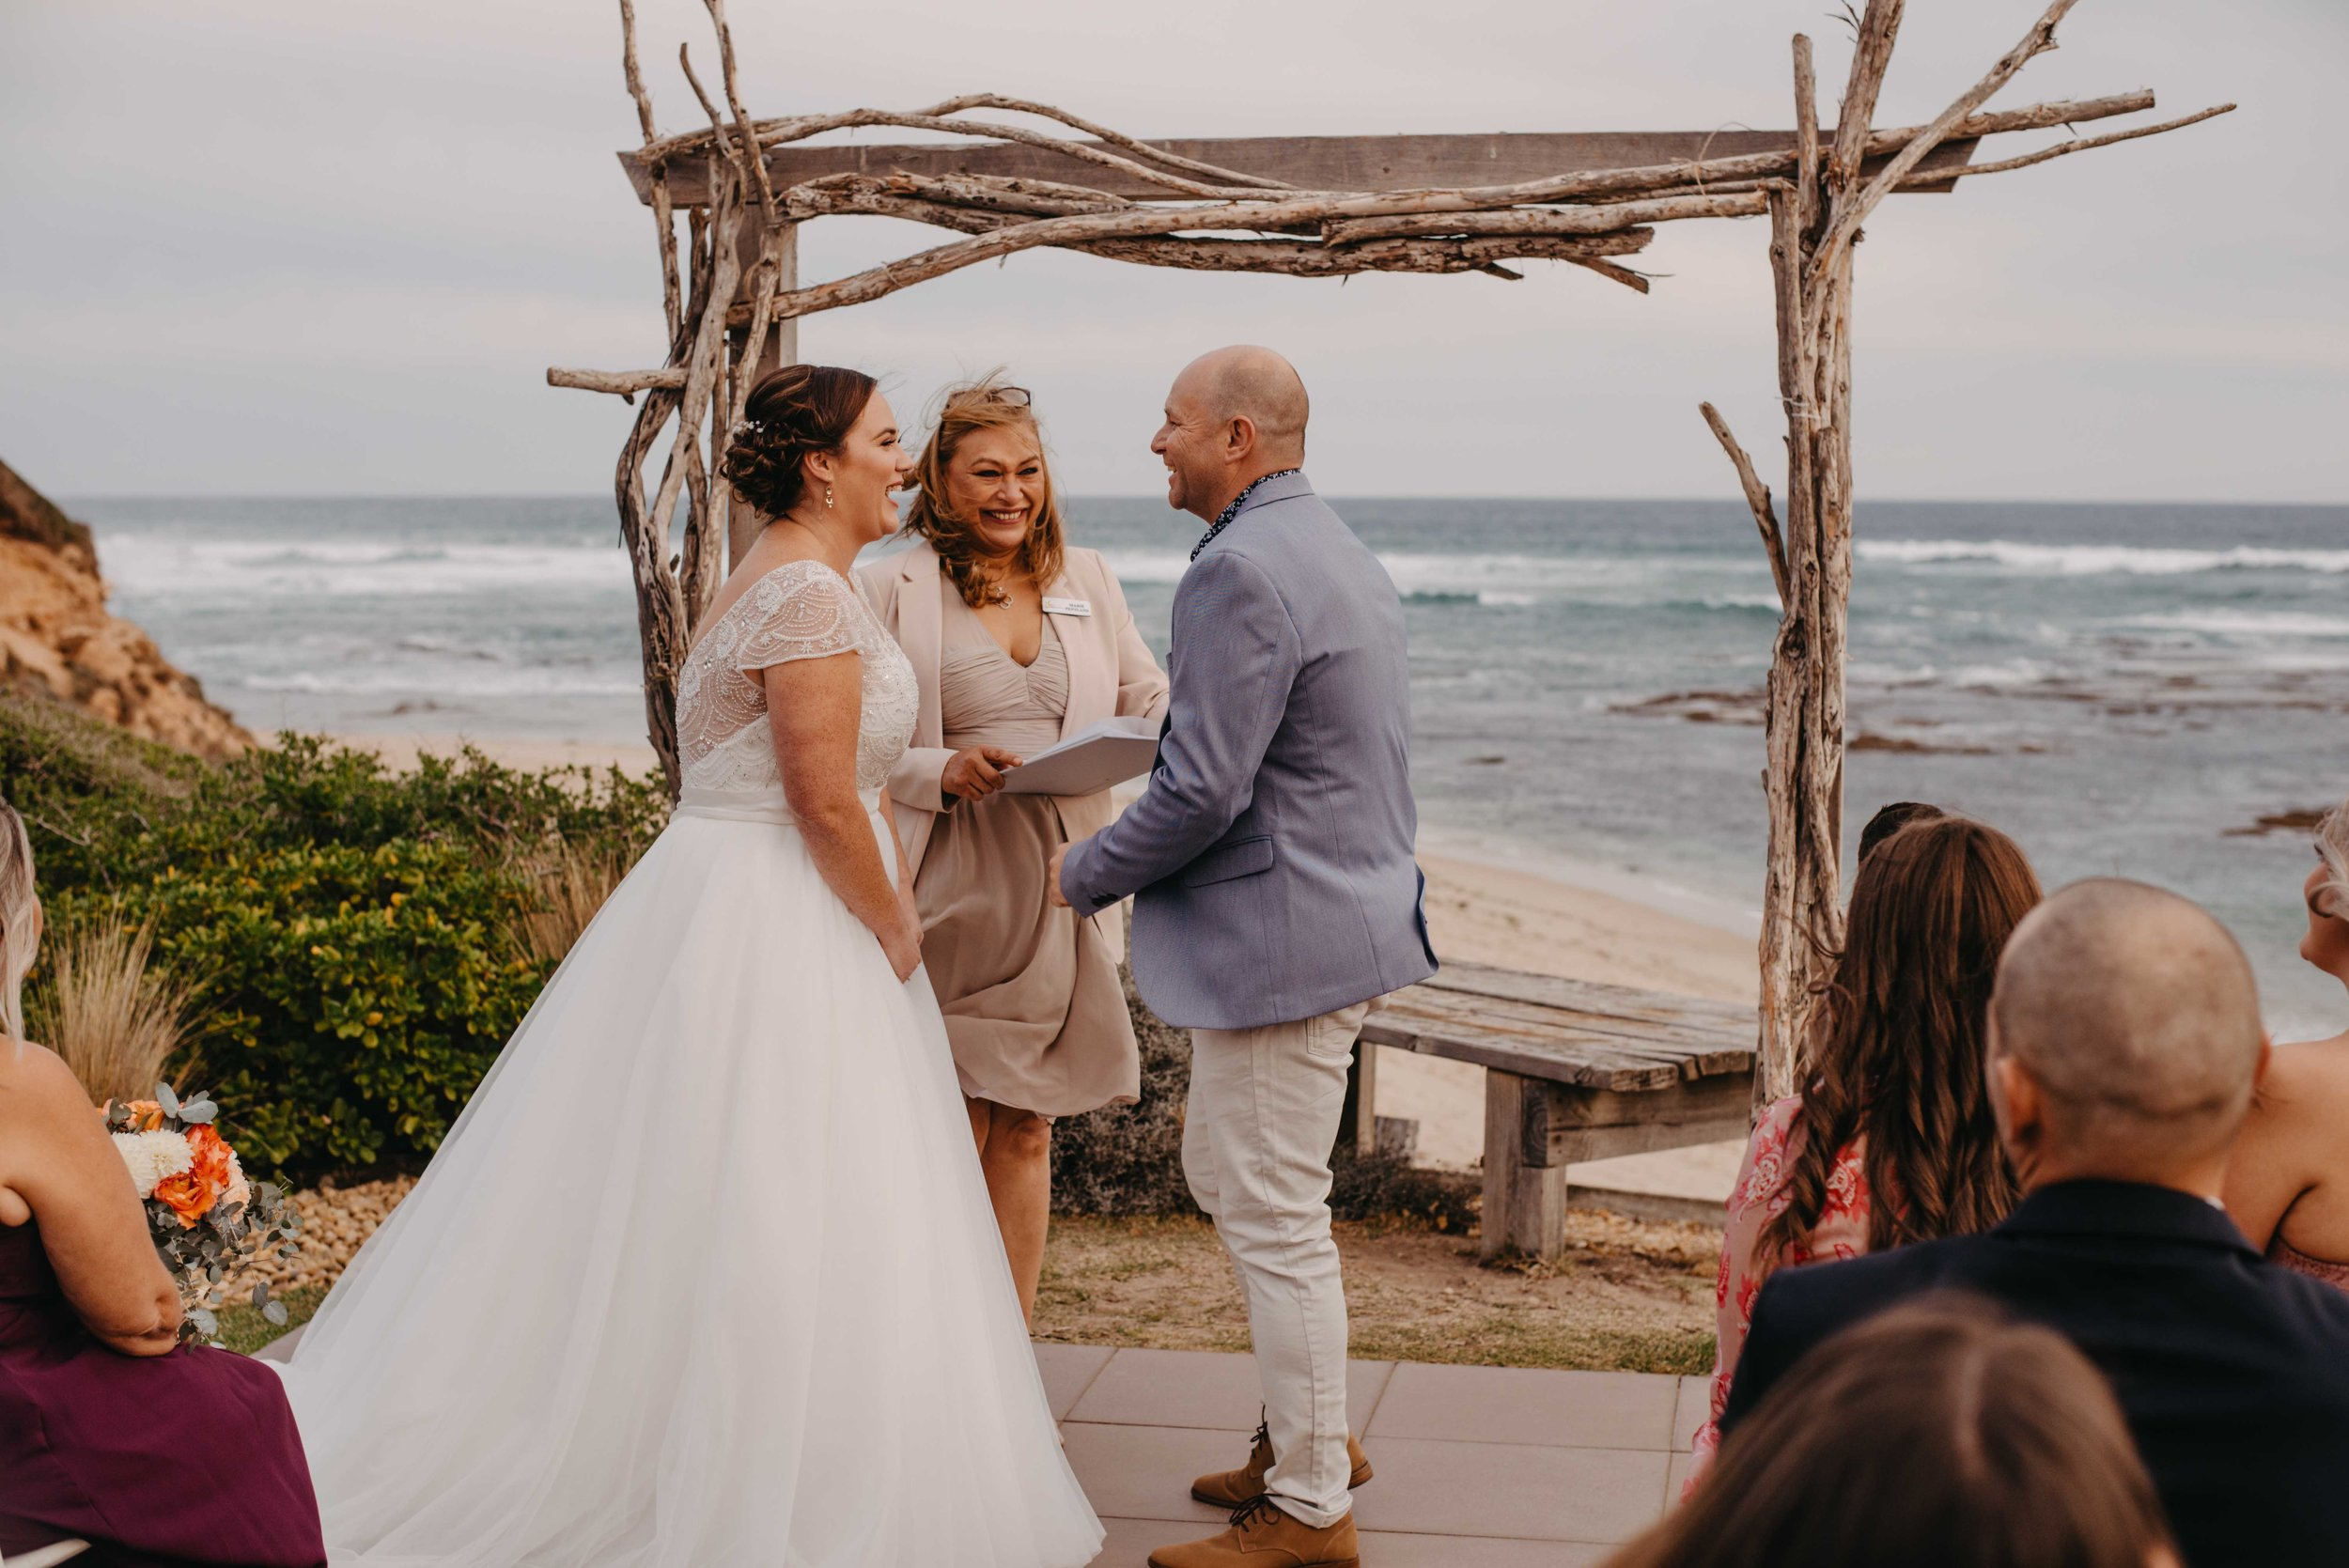 All-Smiles-Sorrento-Wedding-photography-sorrento-wedding-marissa-jade-photography-53.jpg